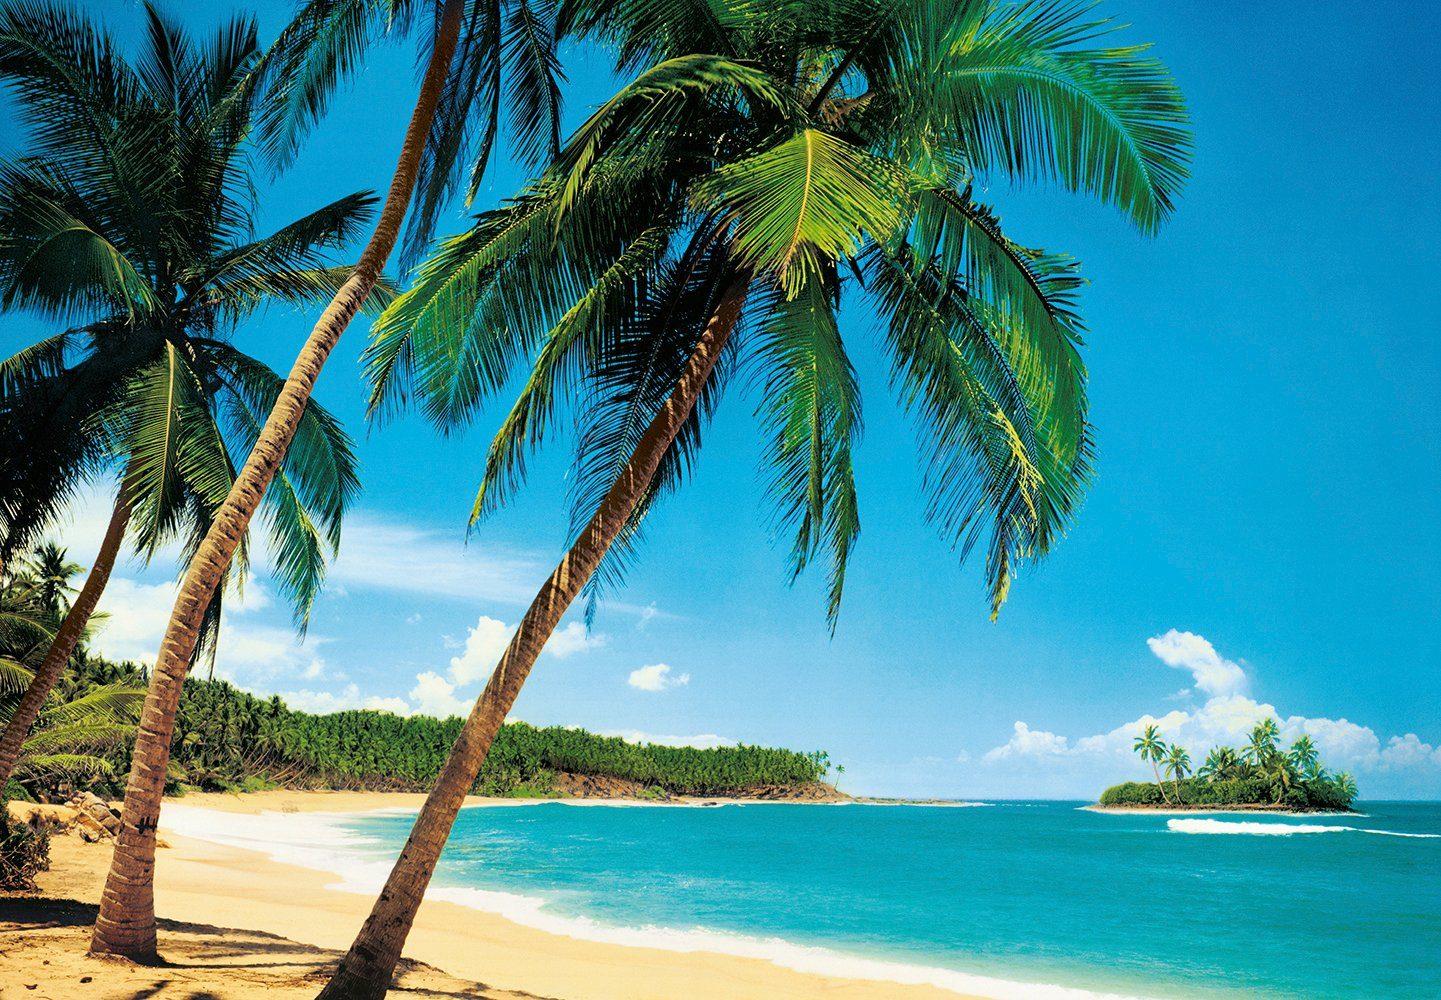 Fototapete »Ile Tropicale«, 8-teilig, 366x254 cm